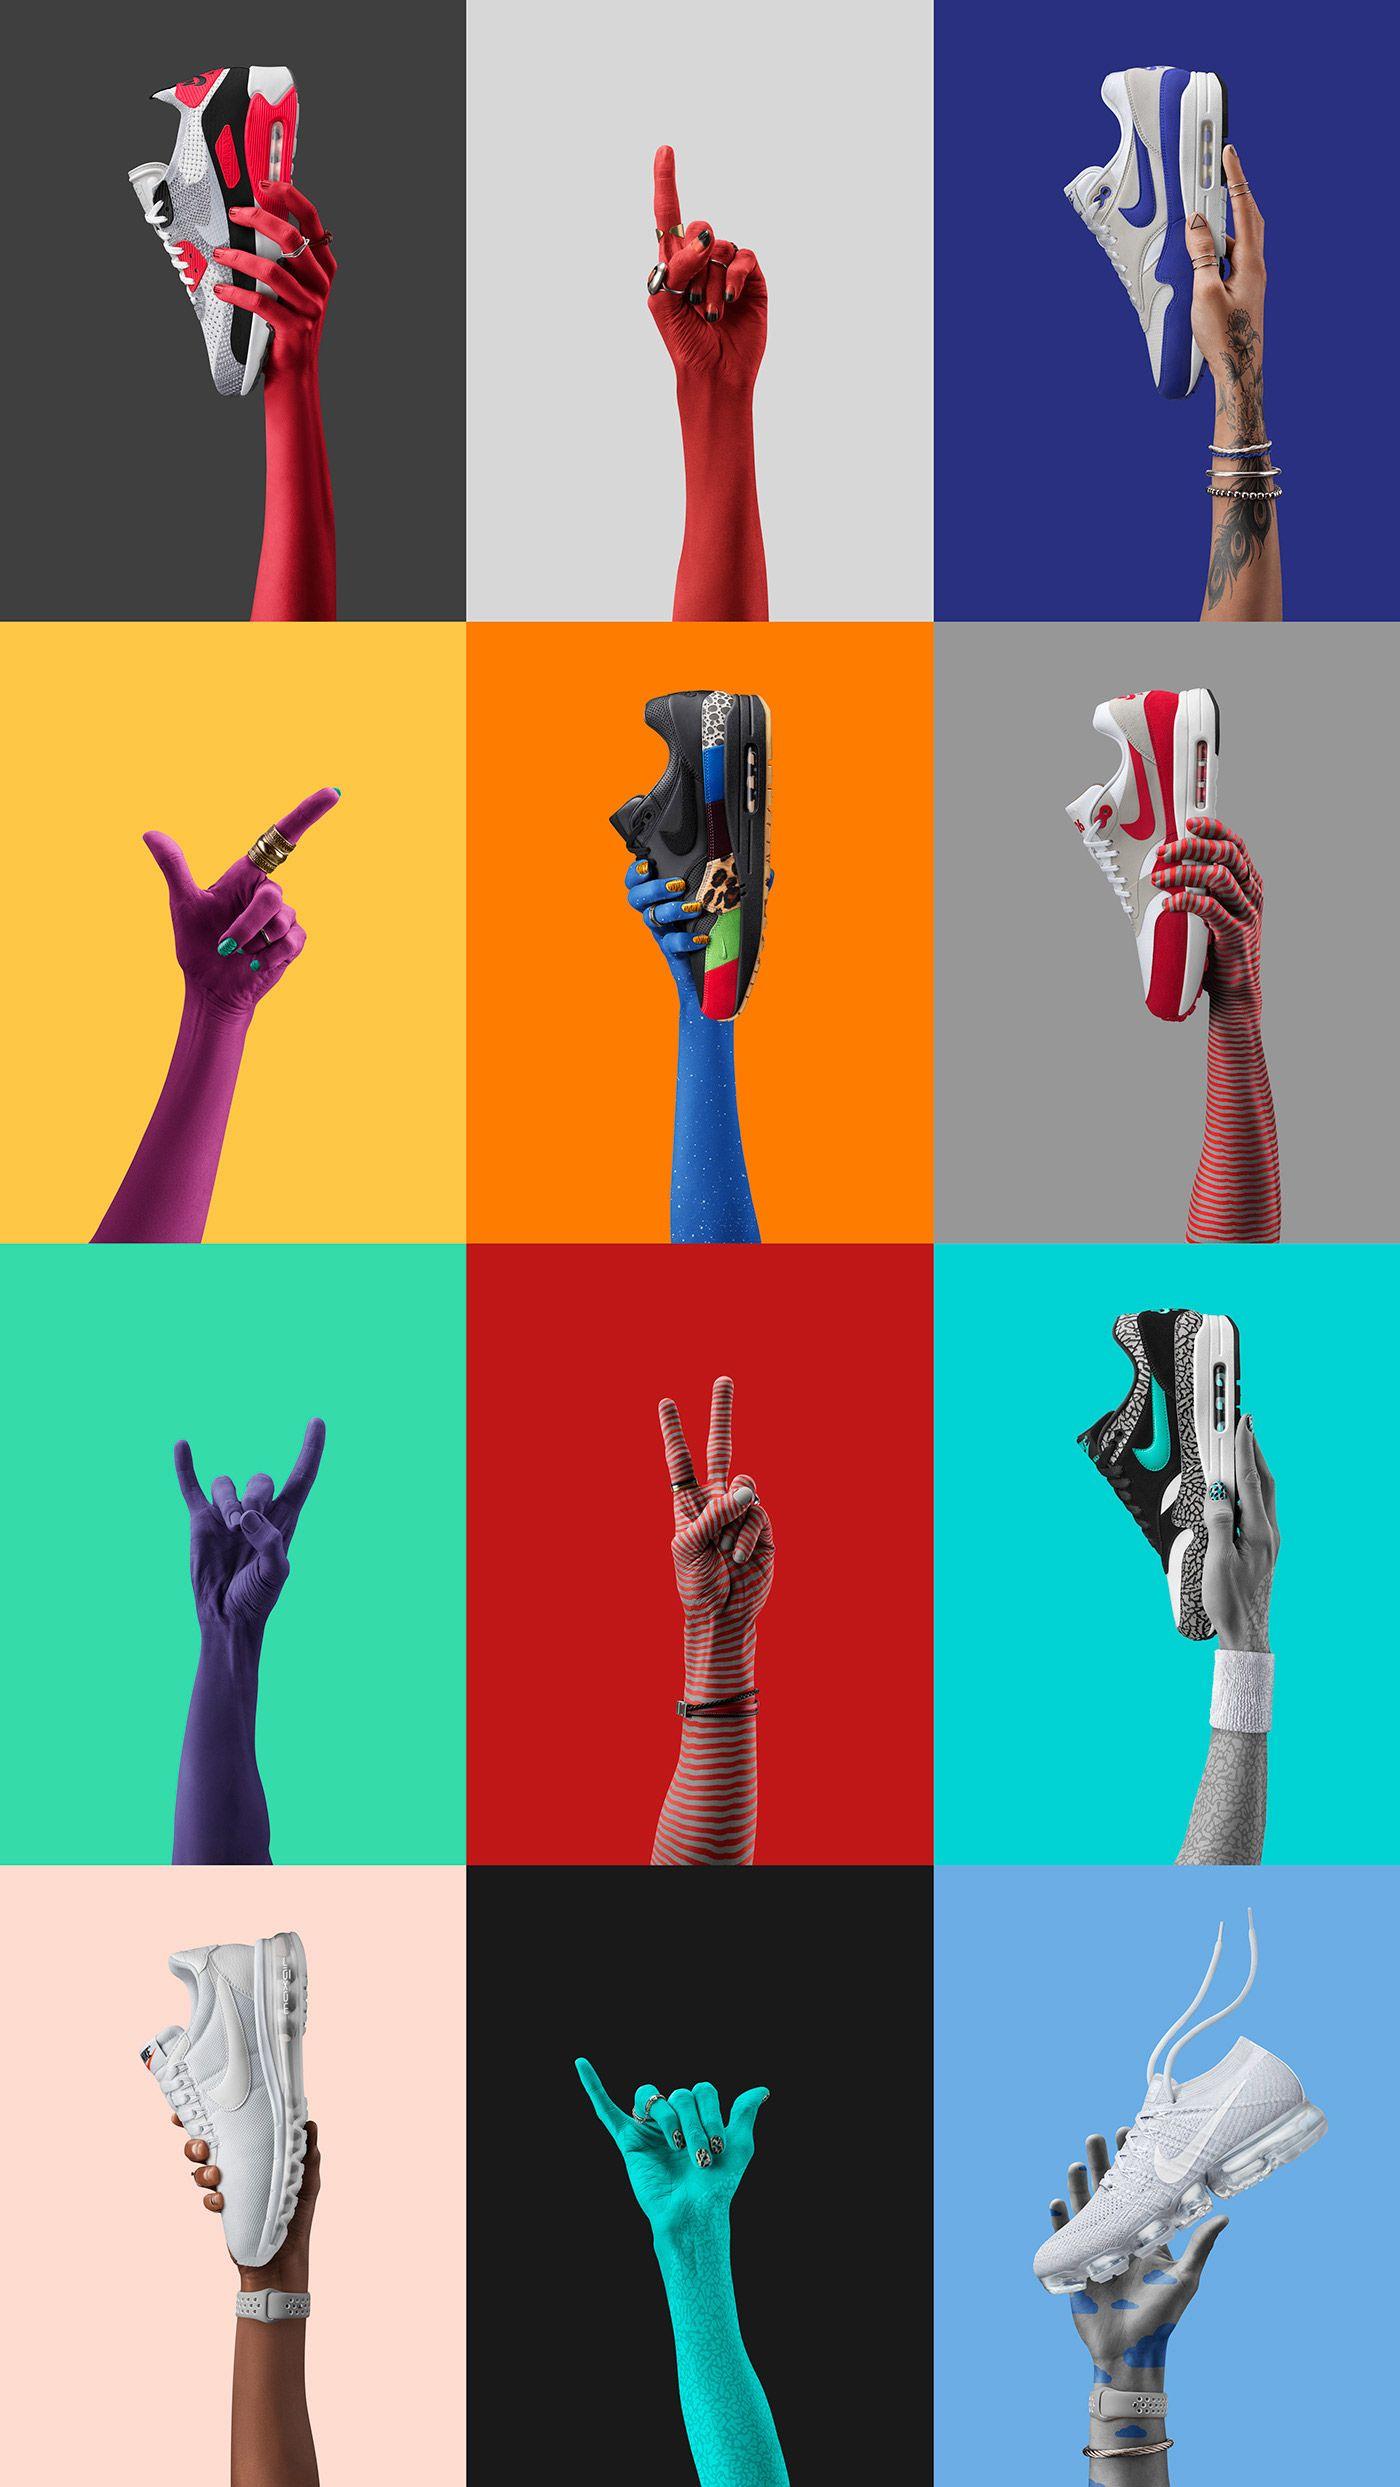 Nike Amd Revolution Mindsparkle Mag Fashion Logo Inspiration Graphic Design Advertising What Is Fashion Designing